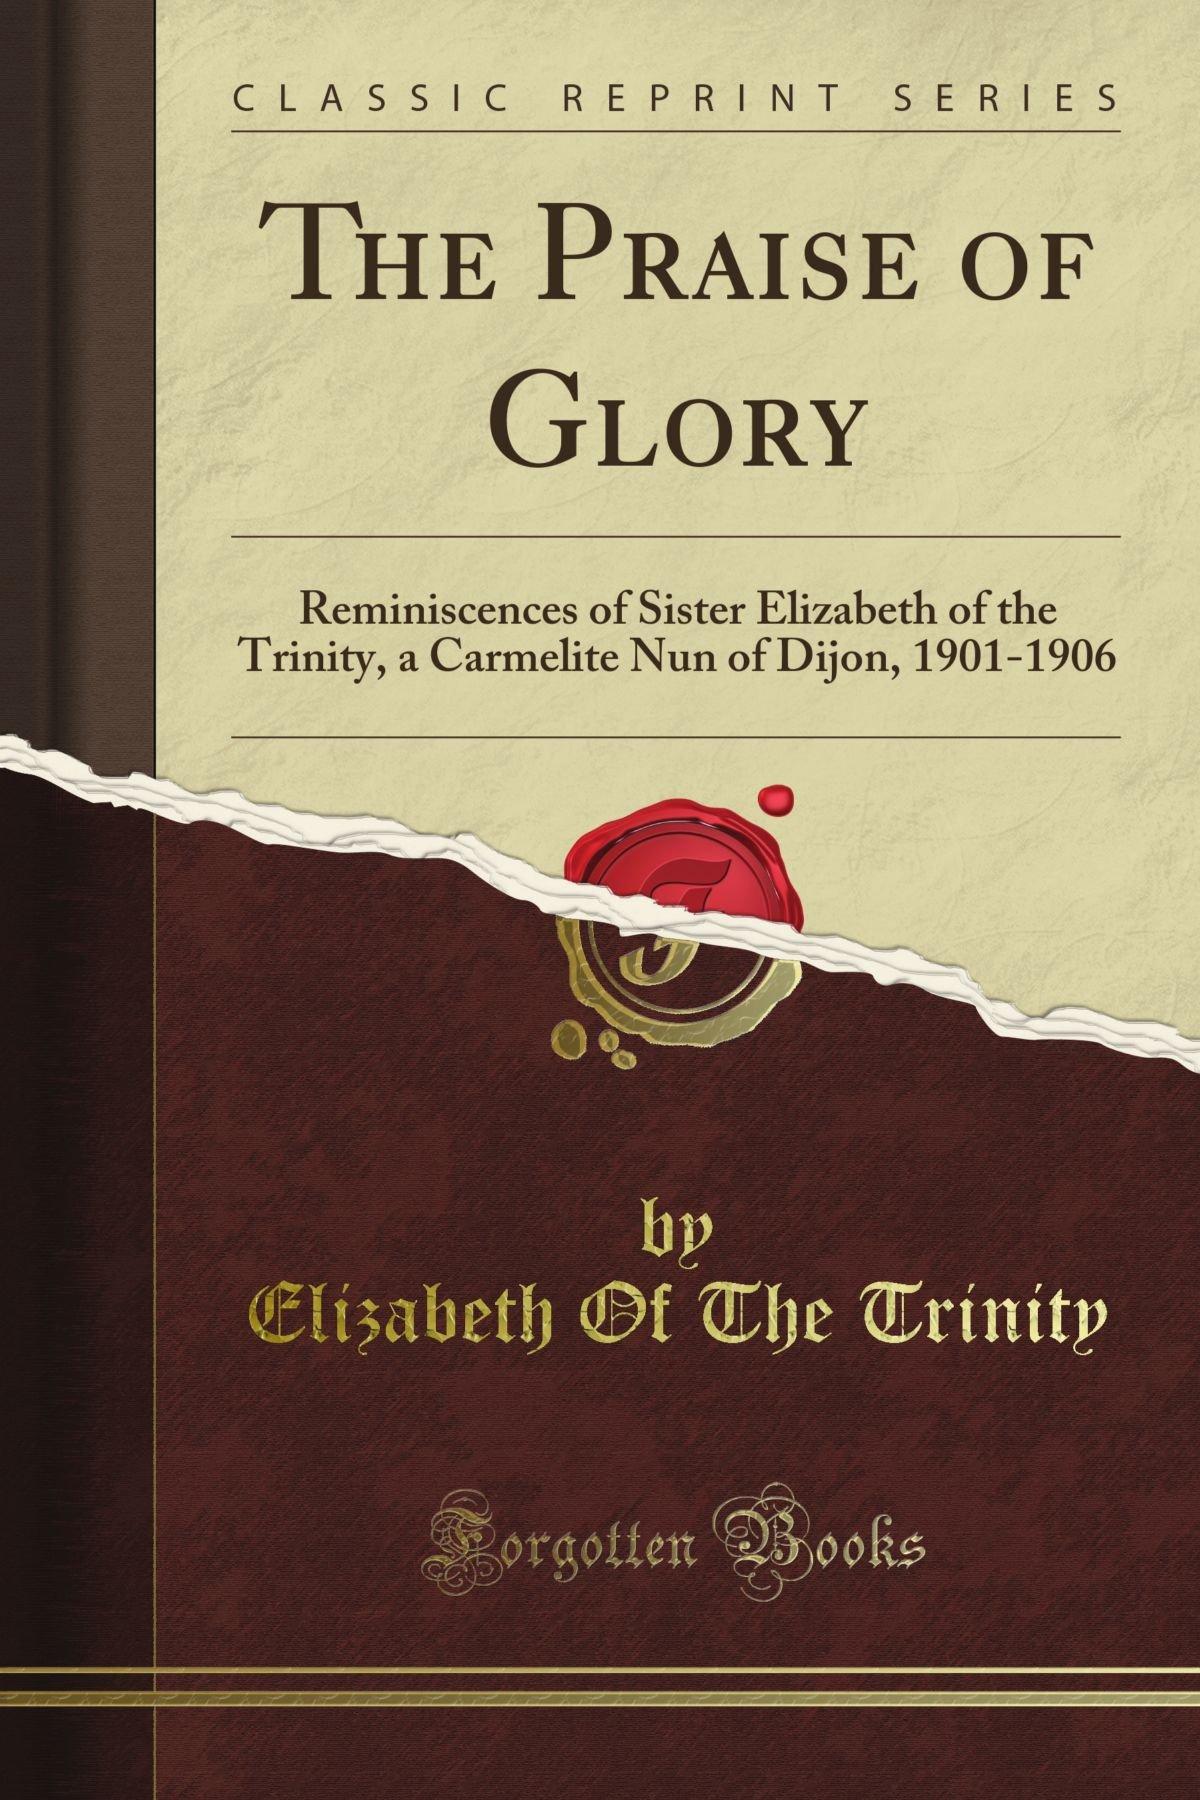 The Praise of Glory: Reminiscences of Sister Elizabeth of the Trinity, a Carmelite Nun of Dijon, 1901-1906 (Classic Reprint)